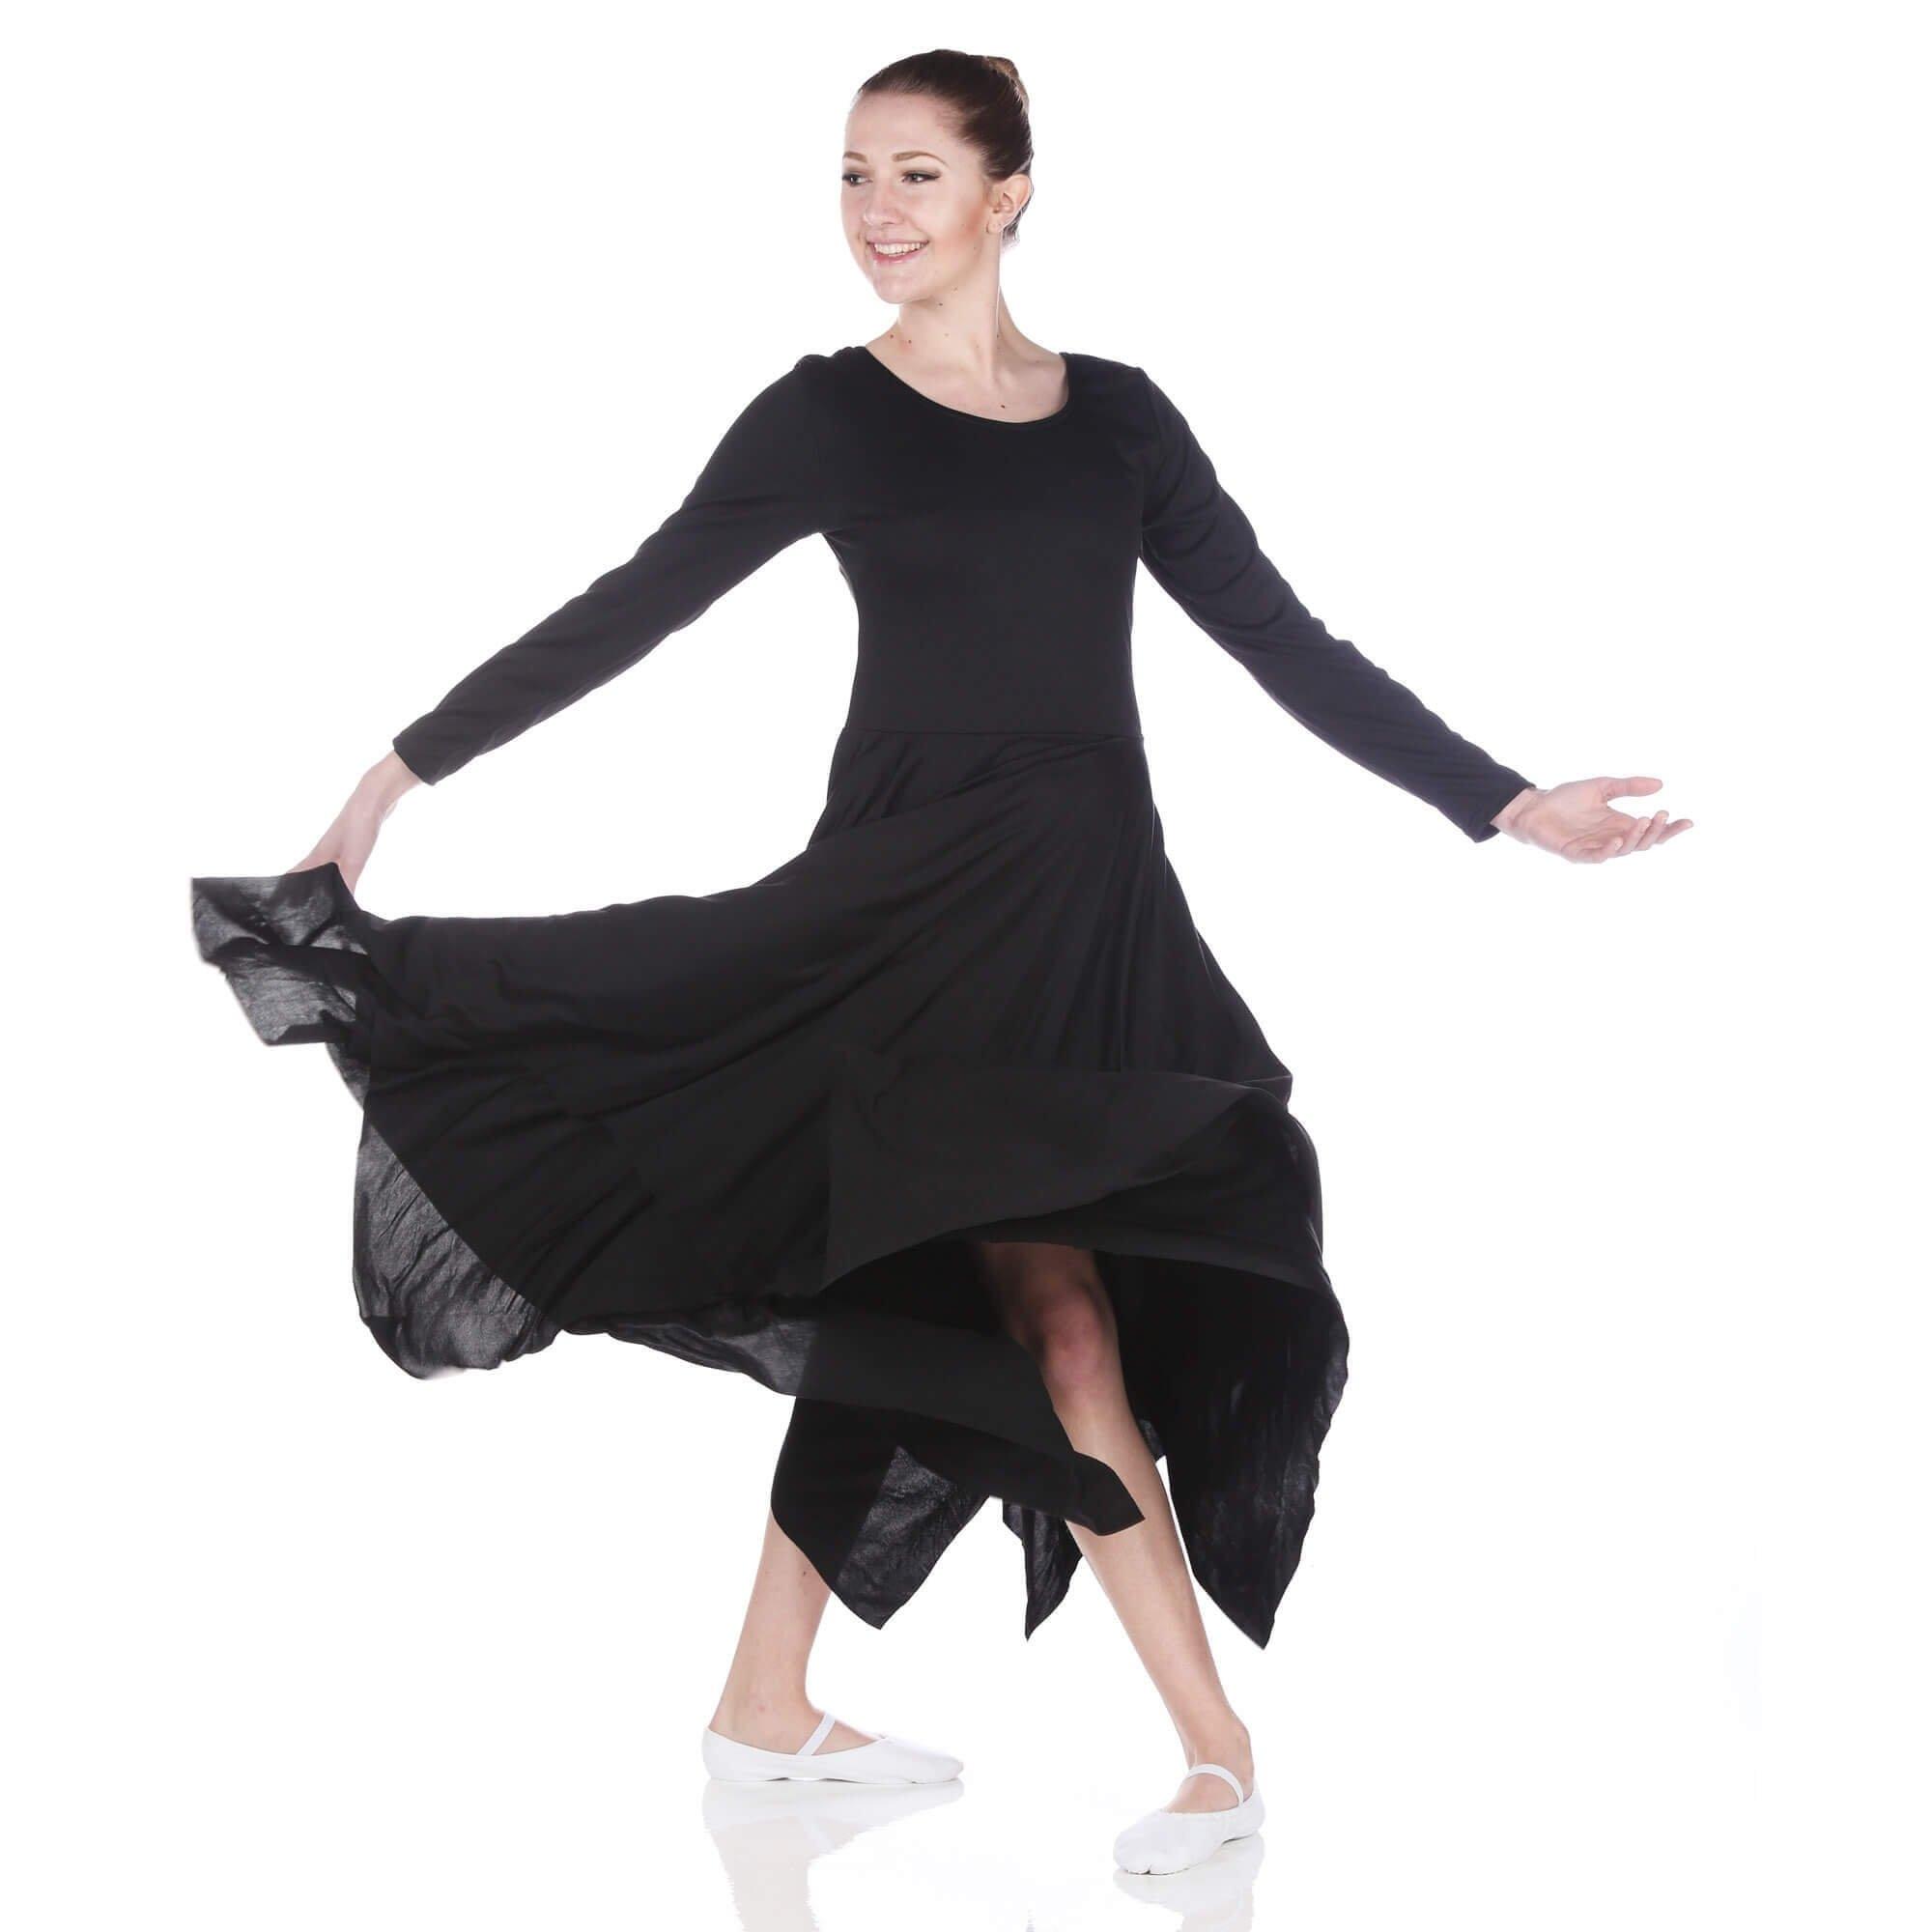 Danzcue Womens Celebration of Spirit Long Sleeve Dance Dress (L-XL, Black) by Danzcue